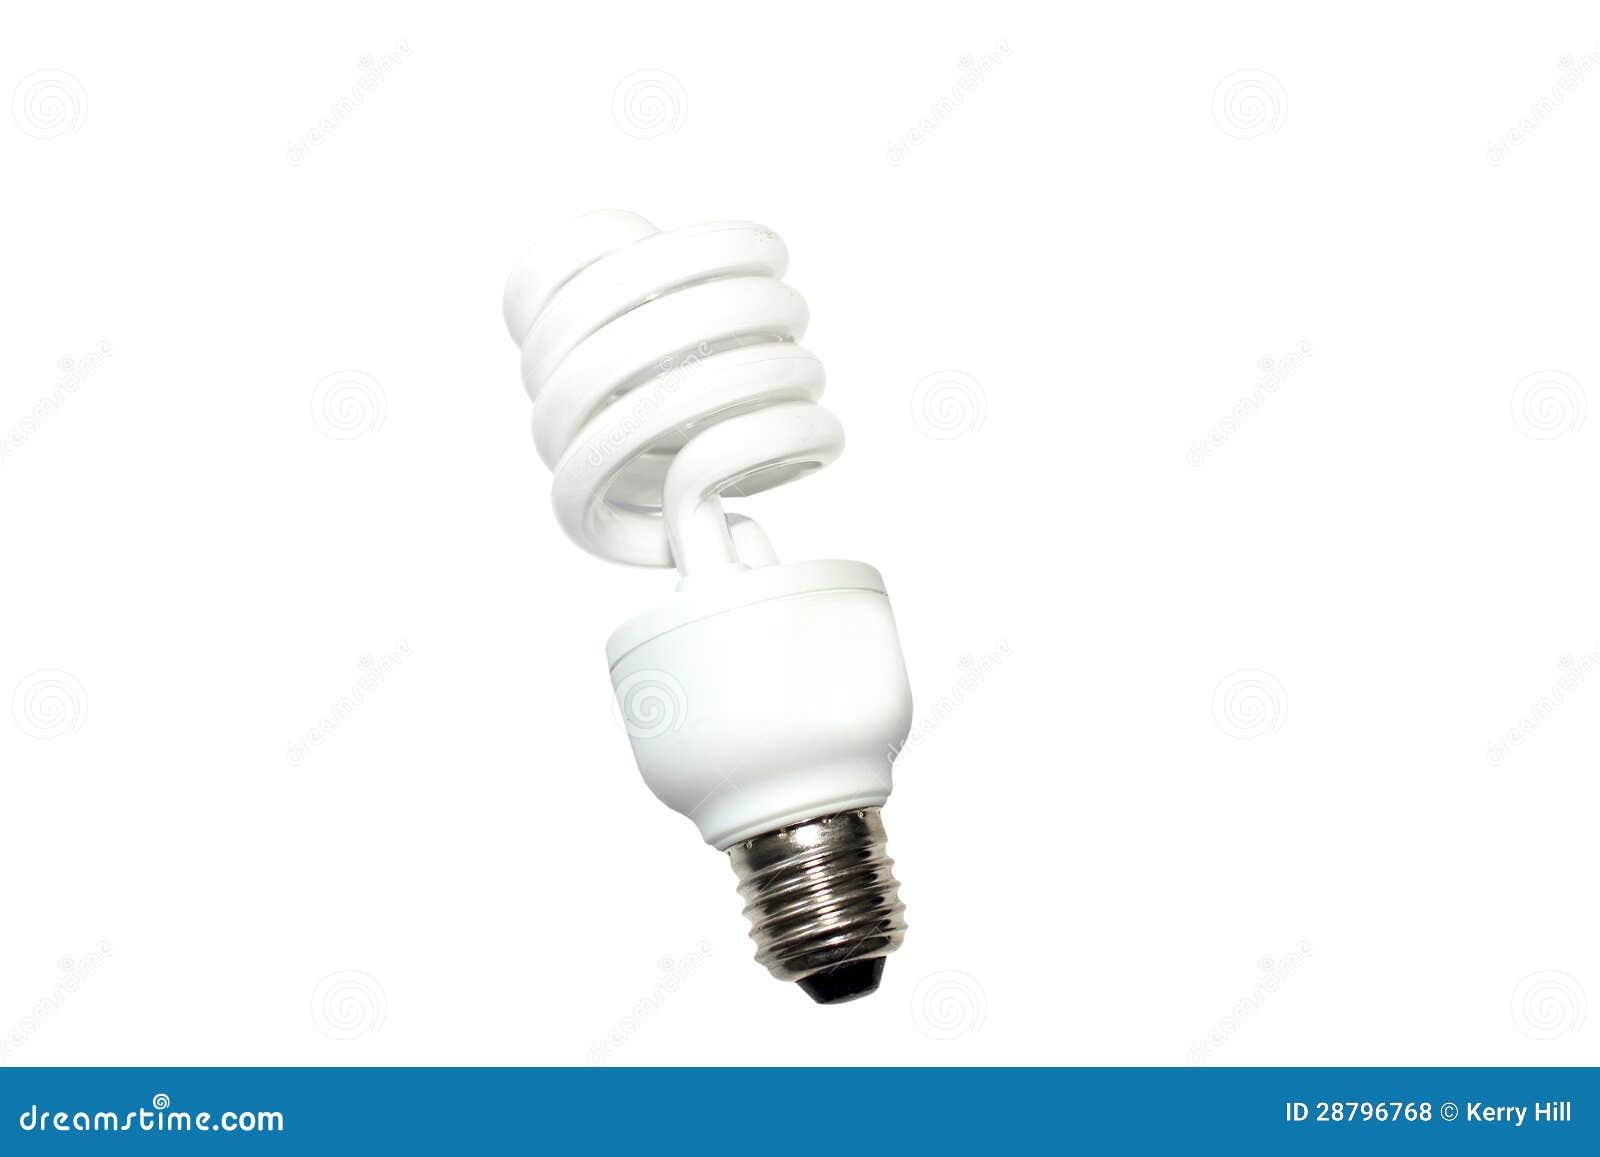 Energy Saving Light Bulb Globe Stock Photo Image 28796768